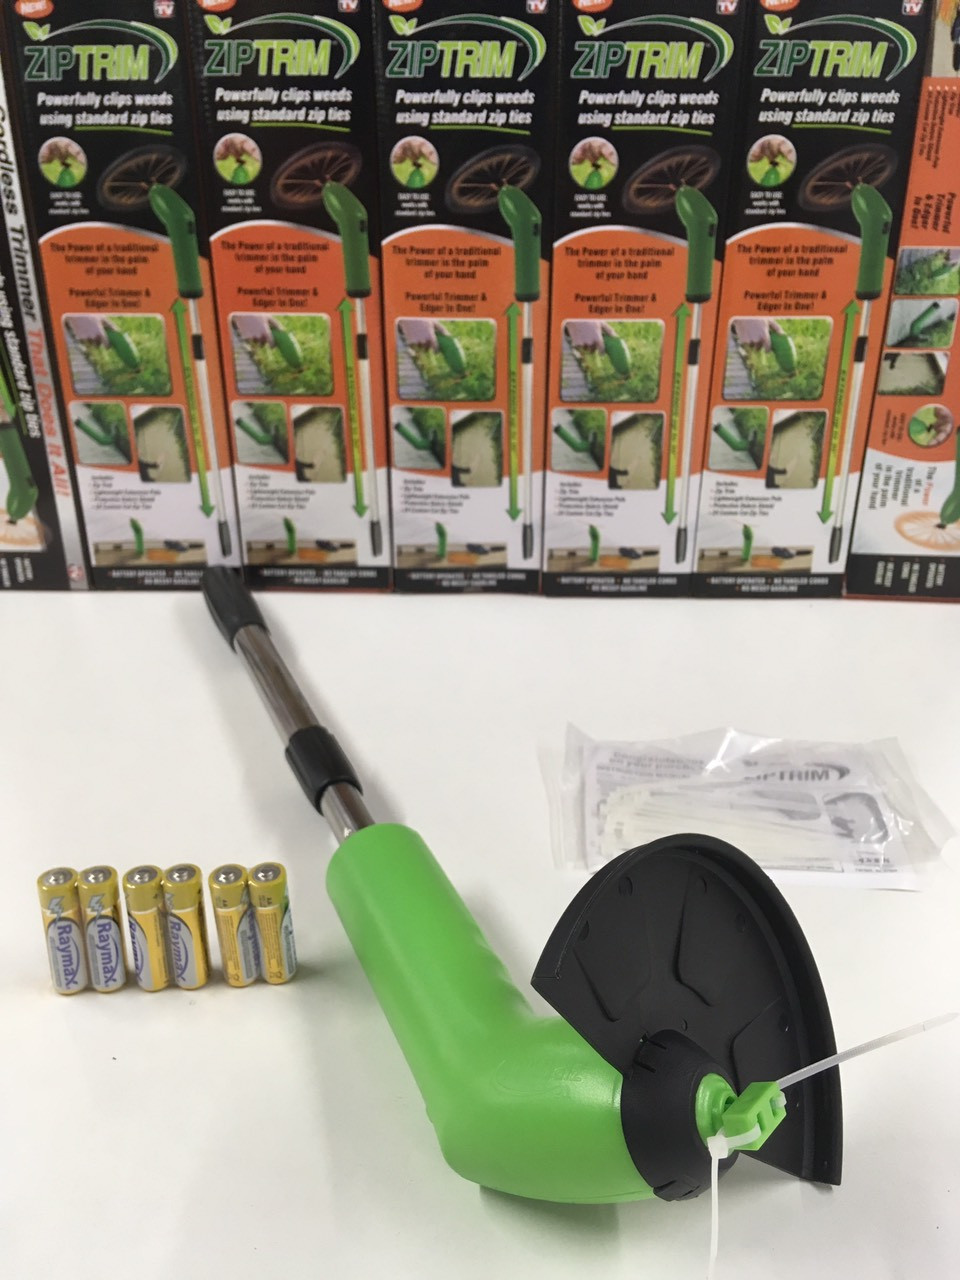 Триммер-газонокосилка для сада Zip Trim, на батарейках, фото 1